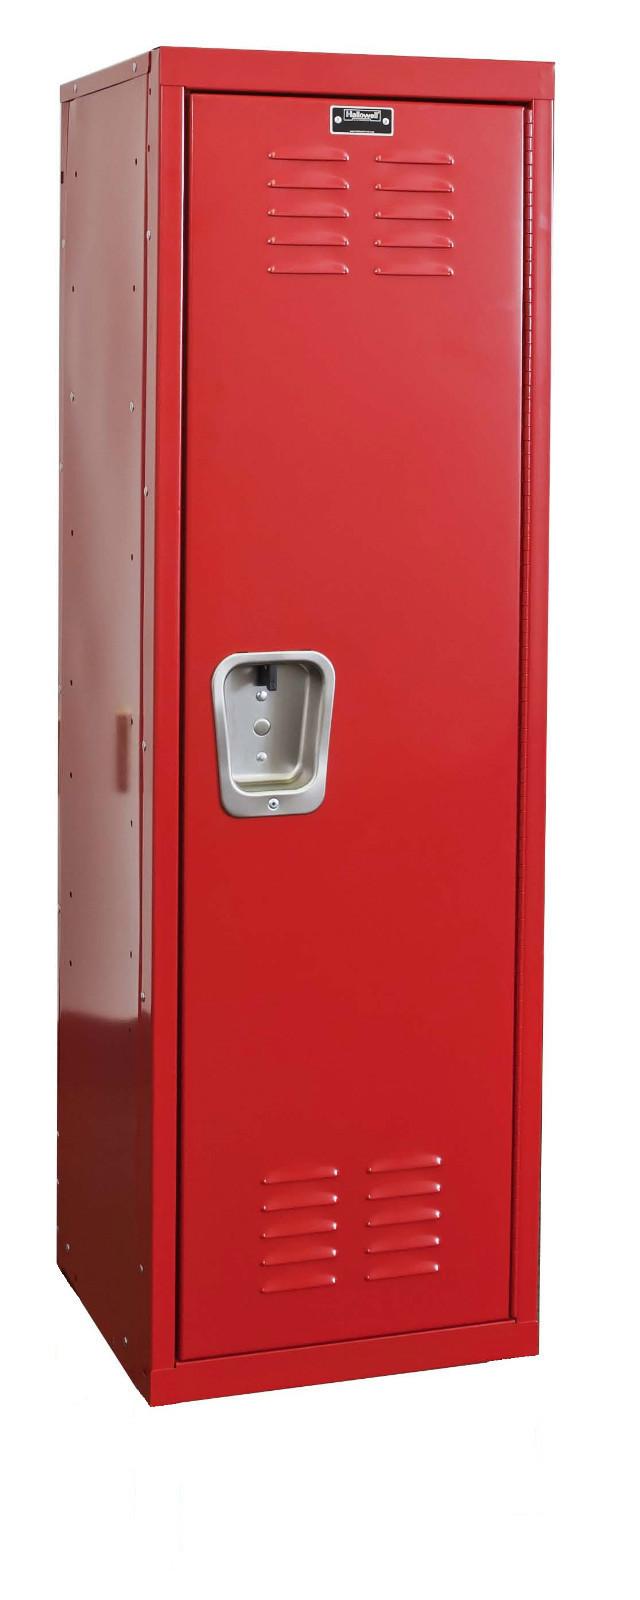 1 New Kids Locker Storage Furniture Gym Clothes Toys